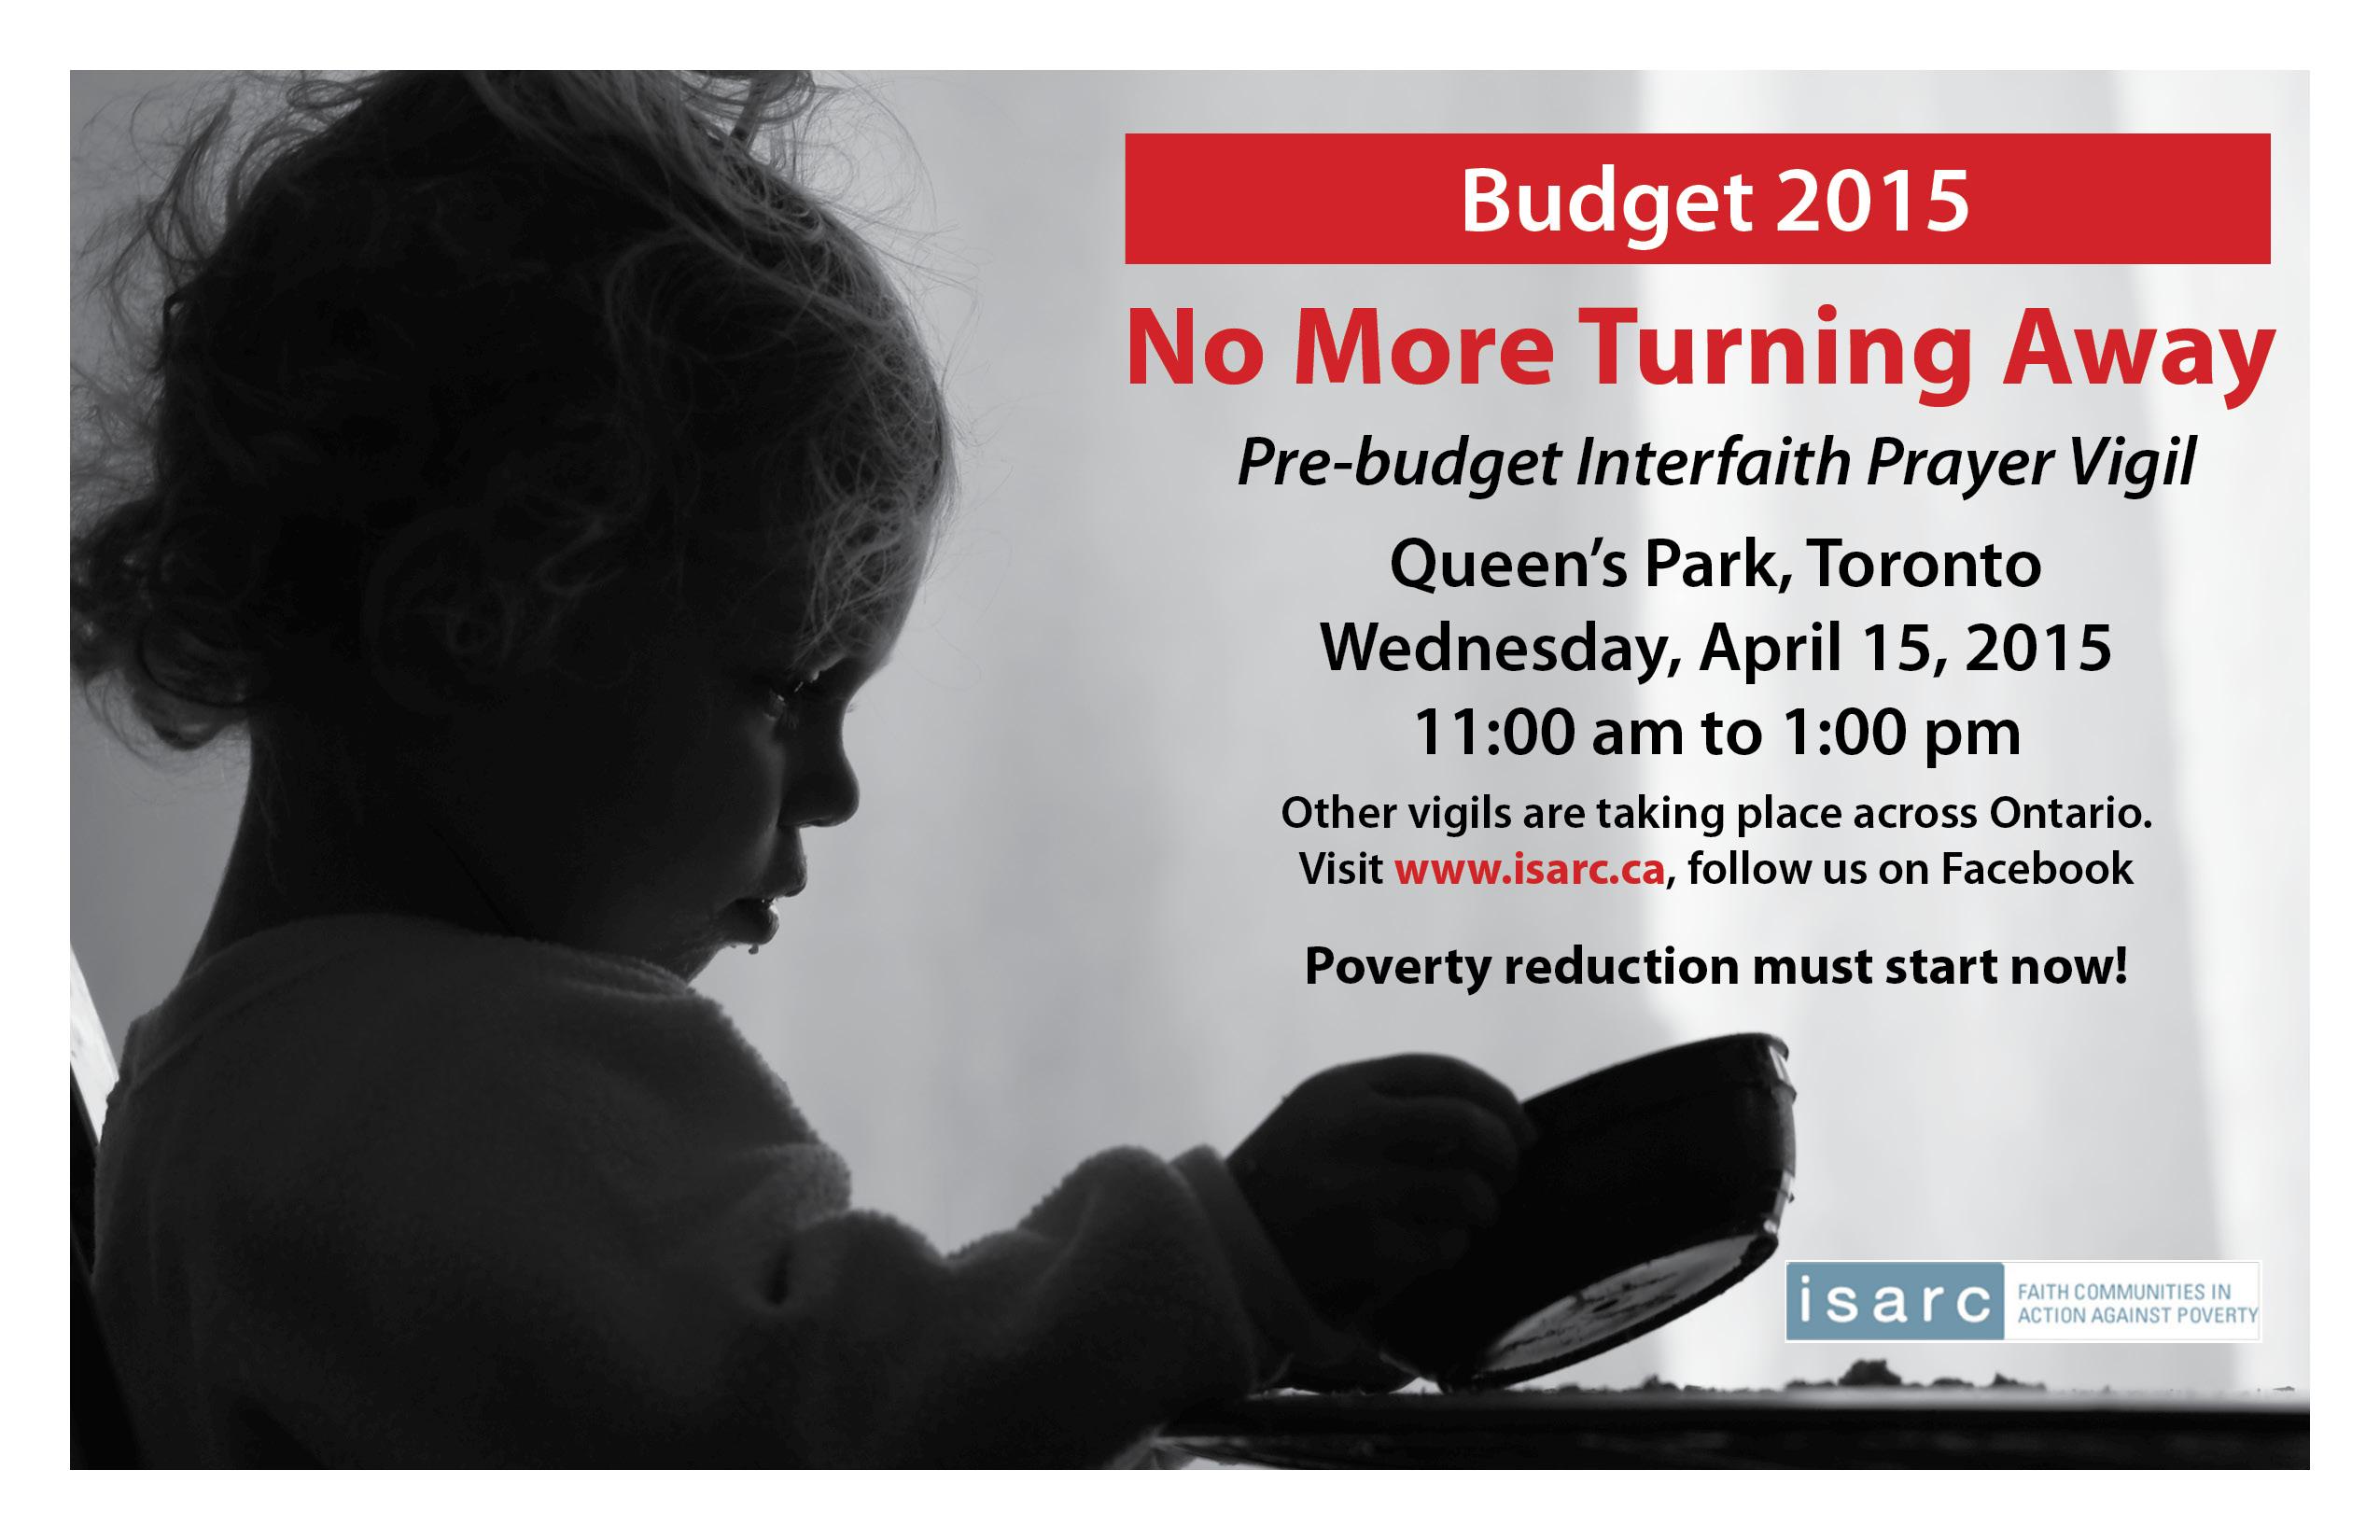 Queen's Park Pre-Budget Prayer Vigil April 15